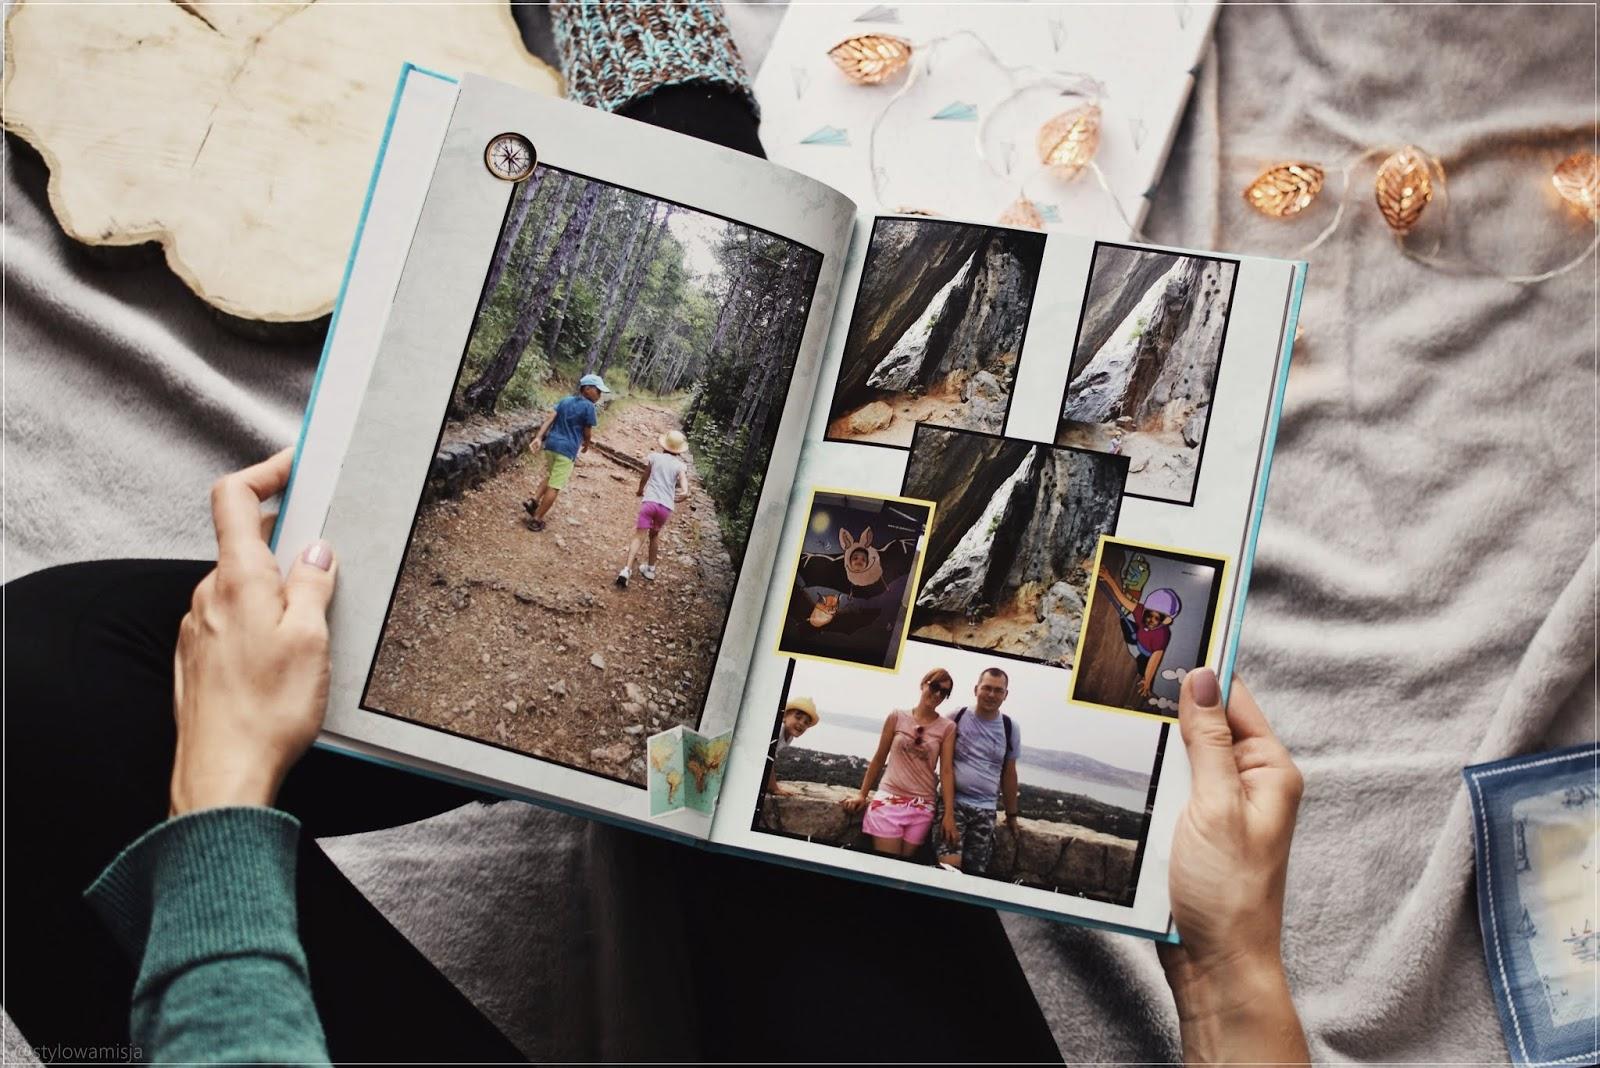 pixbook, fotoksiążka, prezent, poradnik,